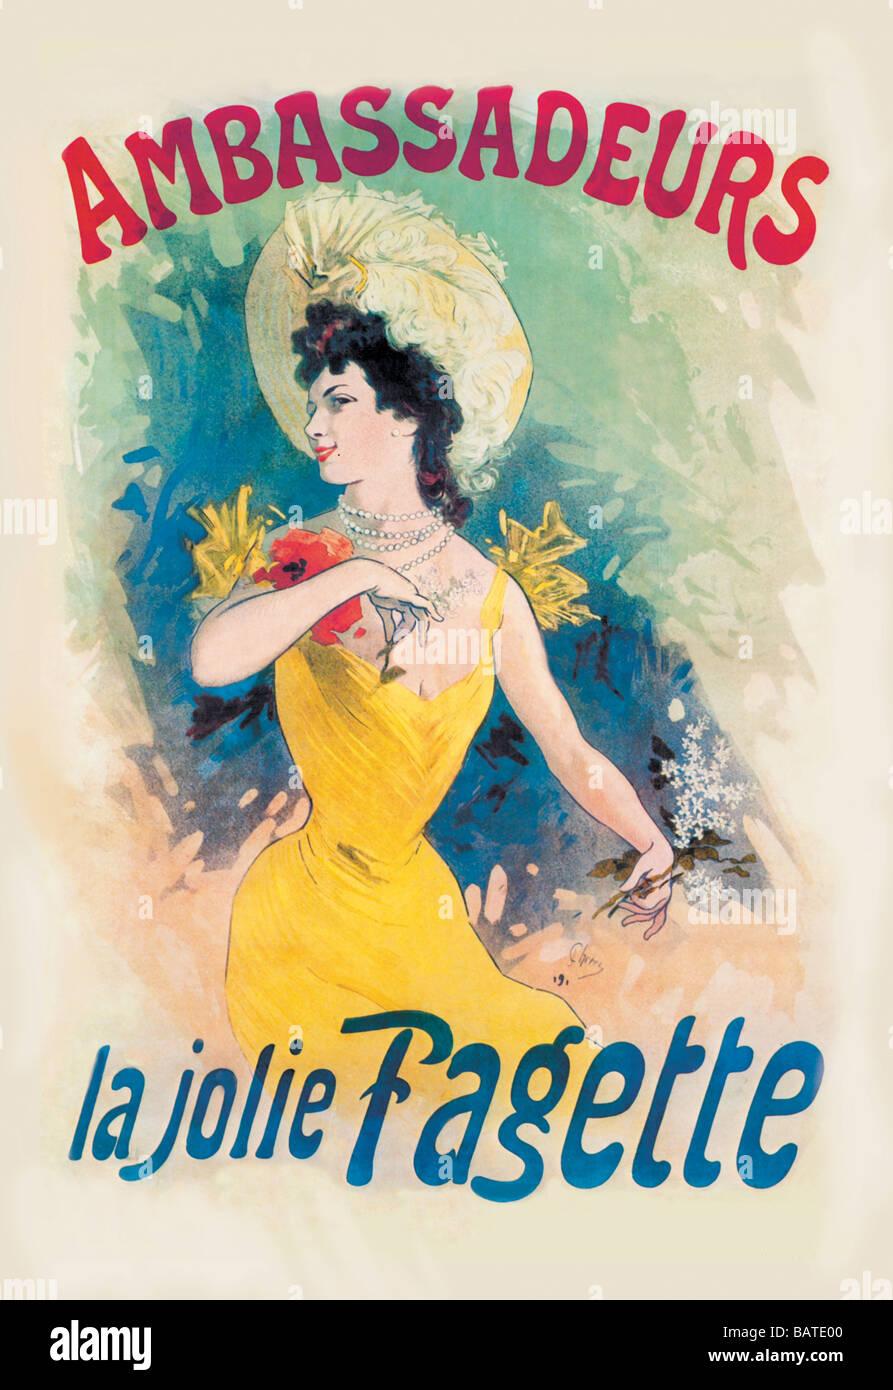 Ambassadeurs: La Jolie Fagette Stock Photo